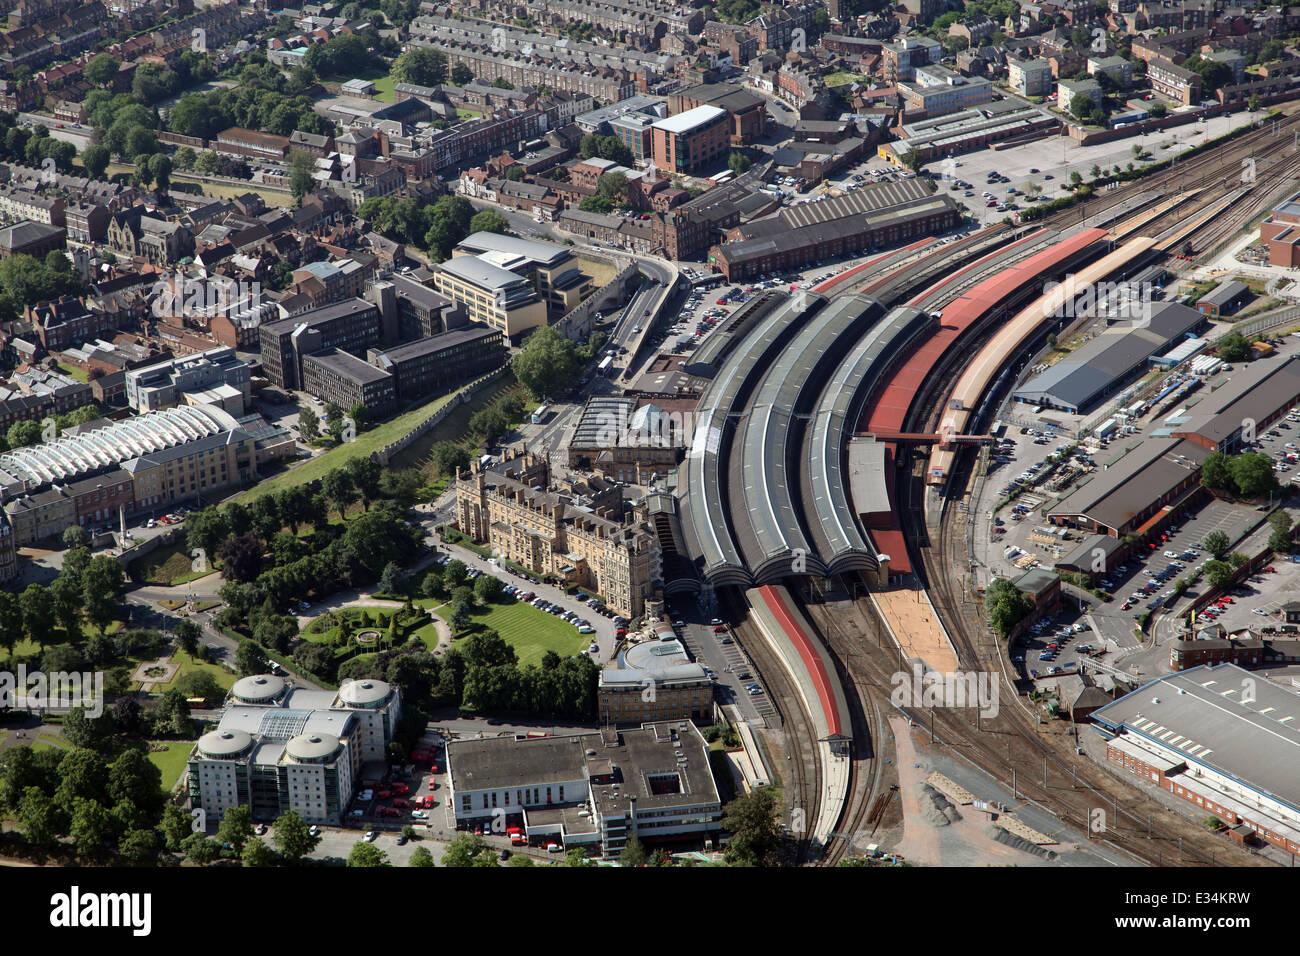 Royal York Hotel York Station